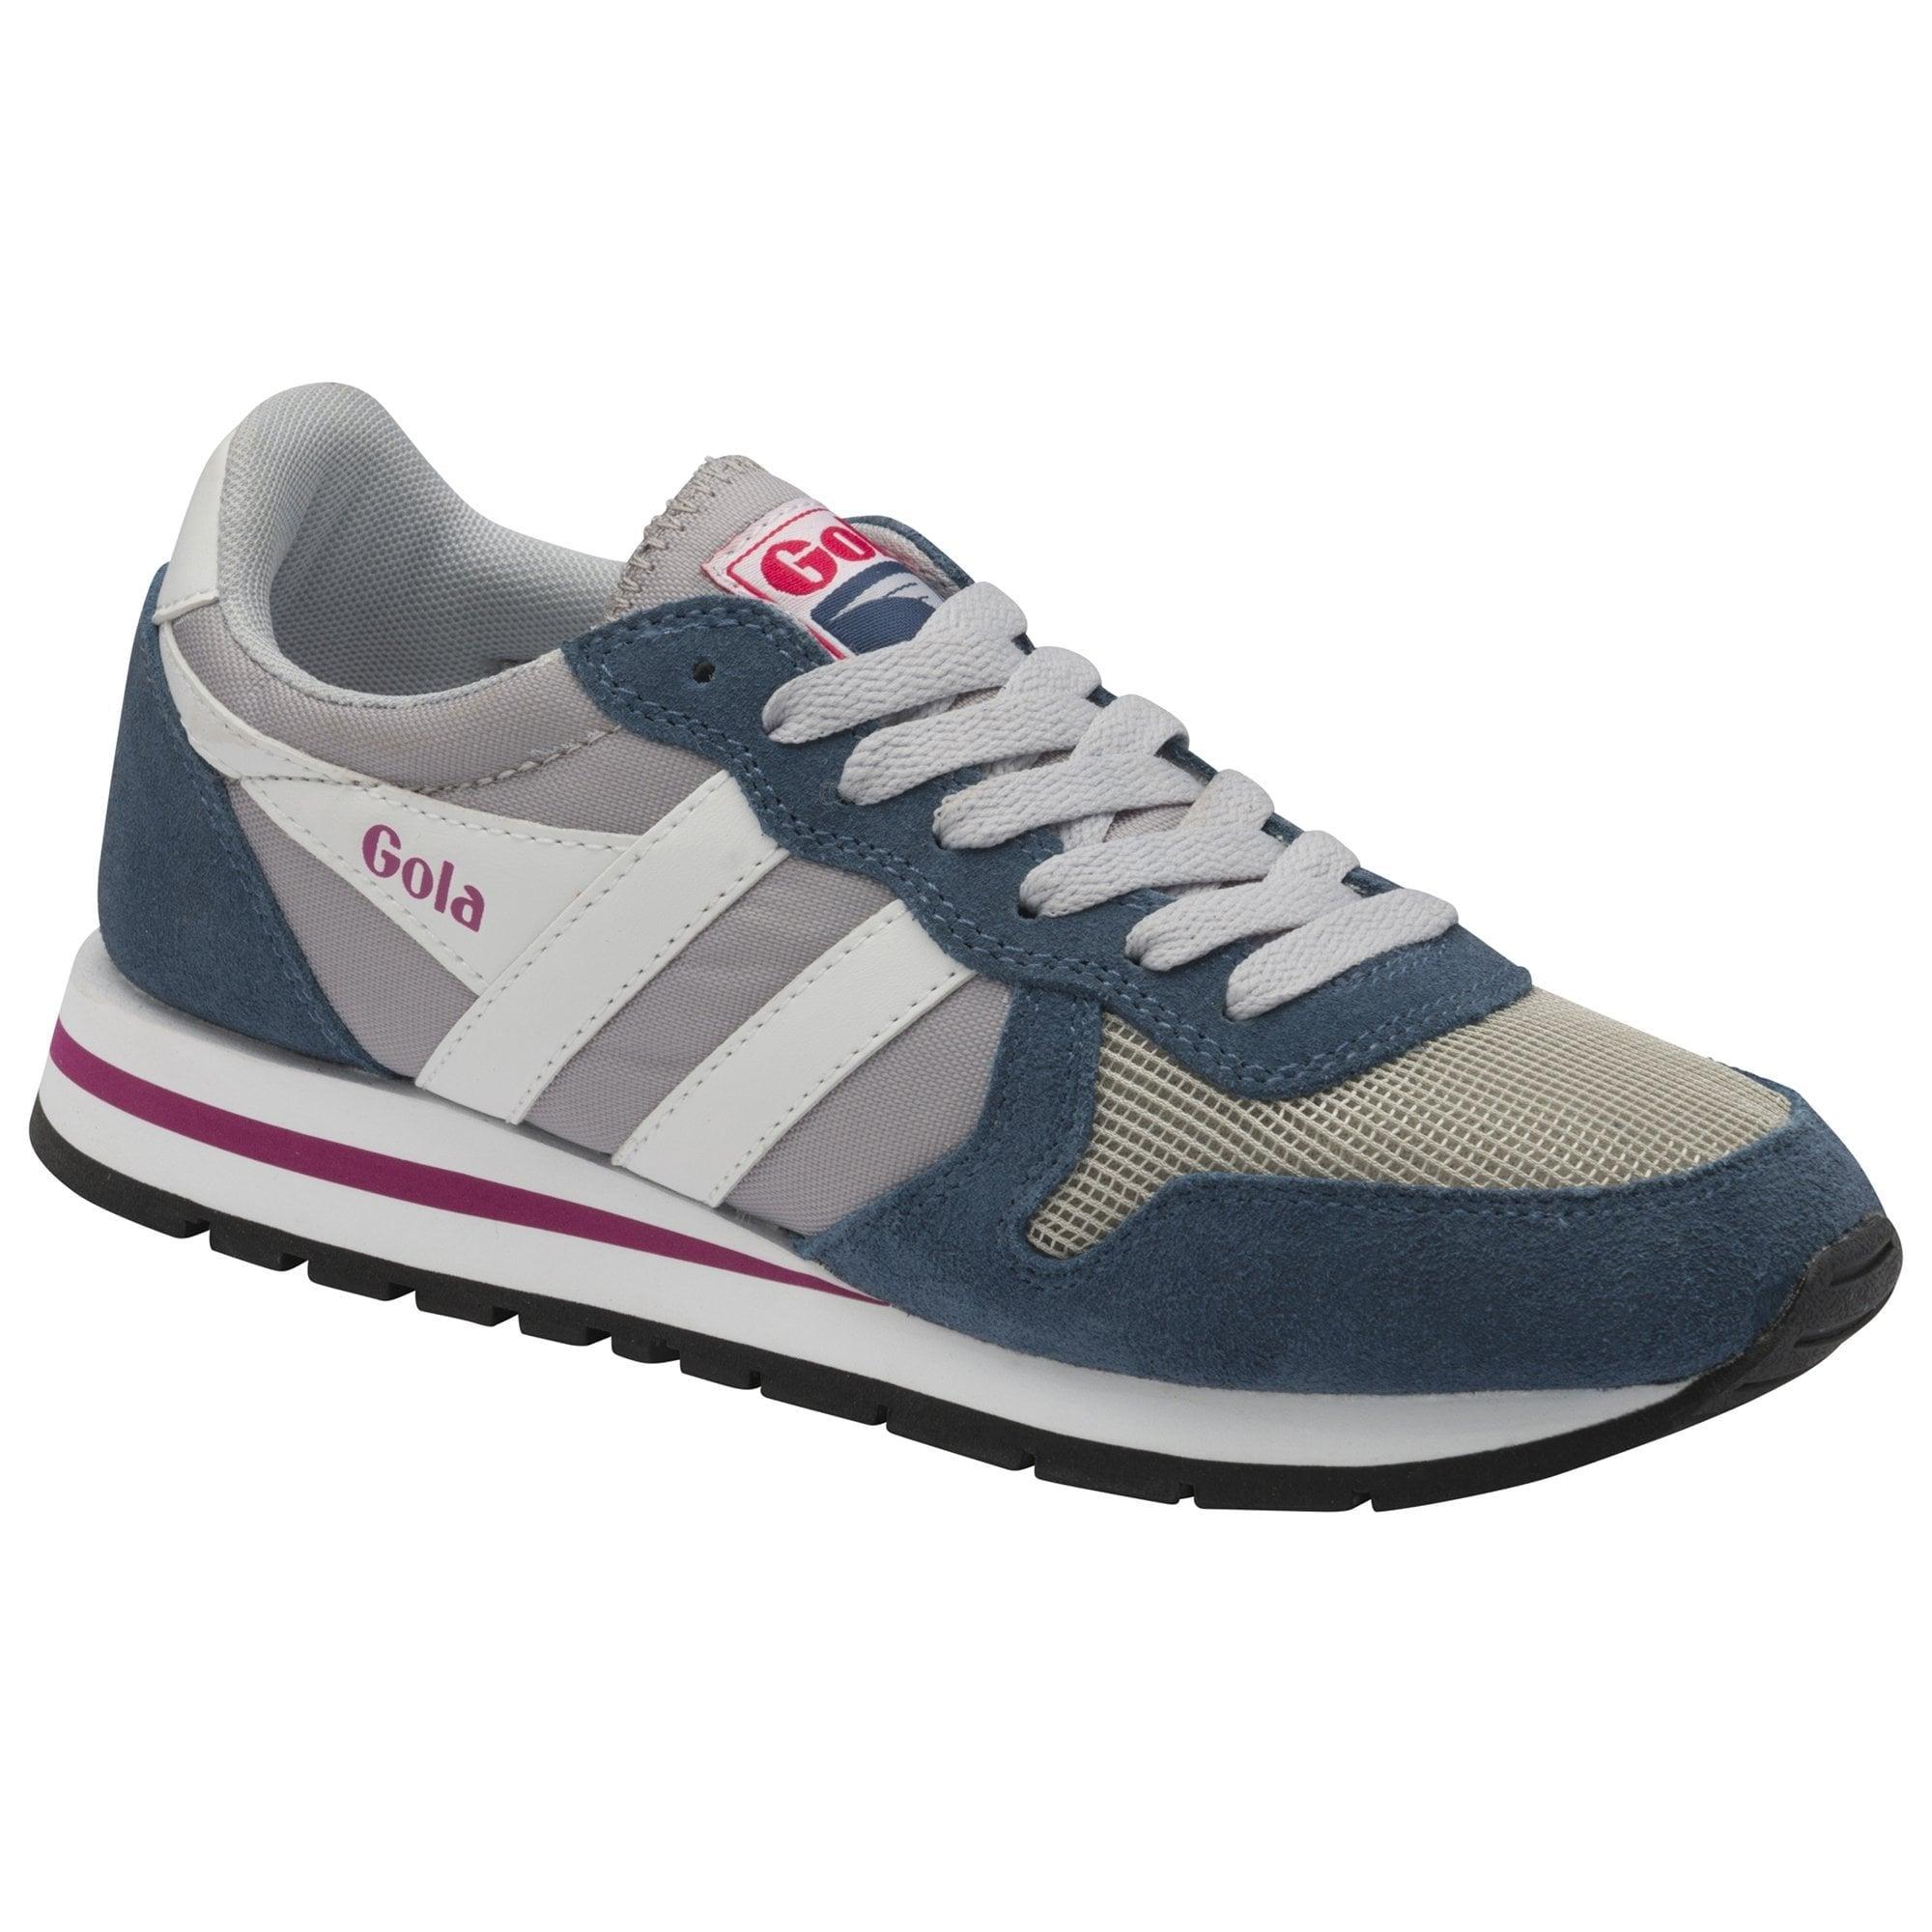 Buy Gola womens Daytona sneakers in